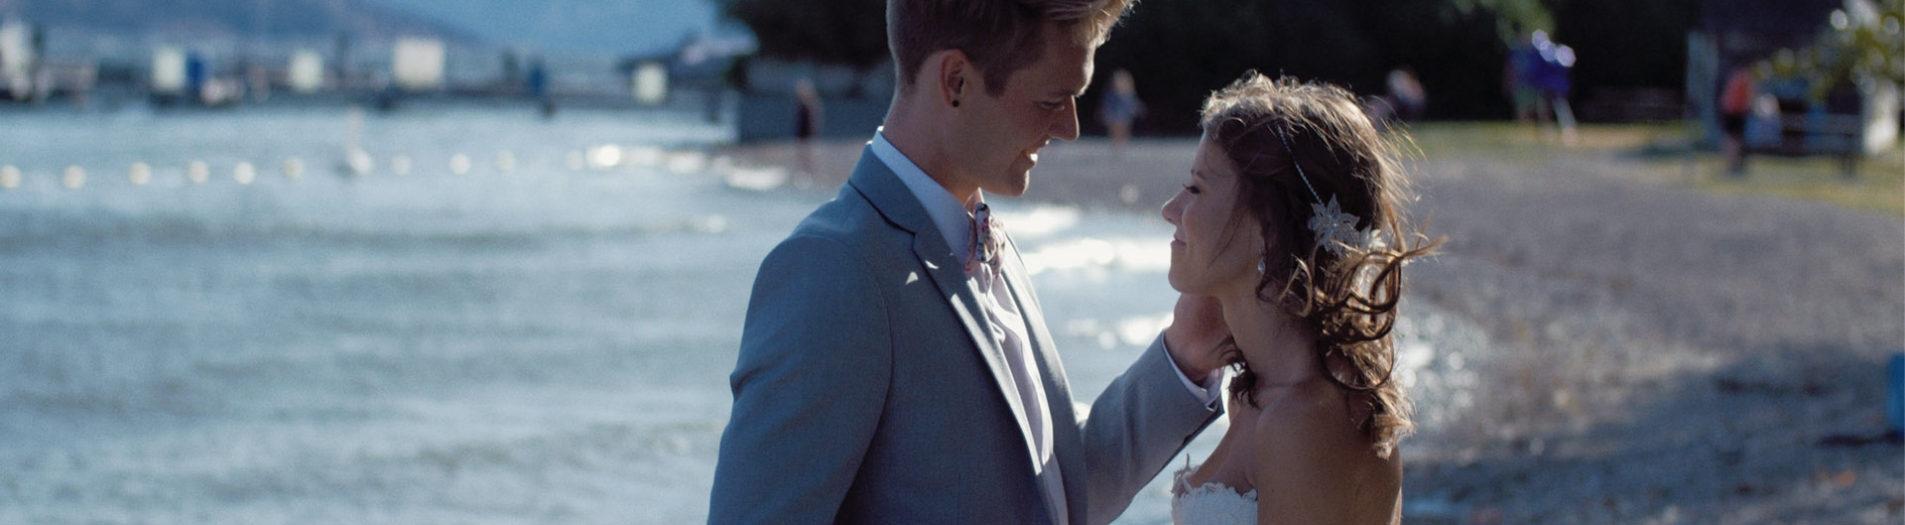 Kelowna Wedding Film at Gellatty Nut Farm & The Cove Lakeside Resort | Rachel + Wes